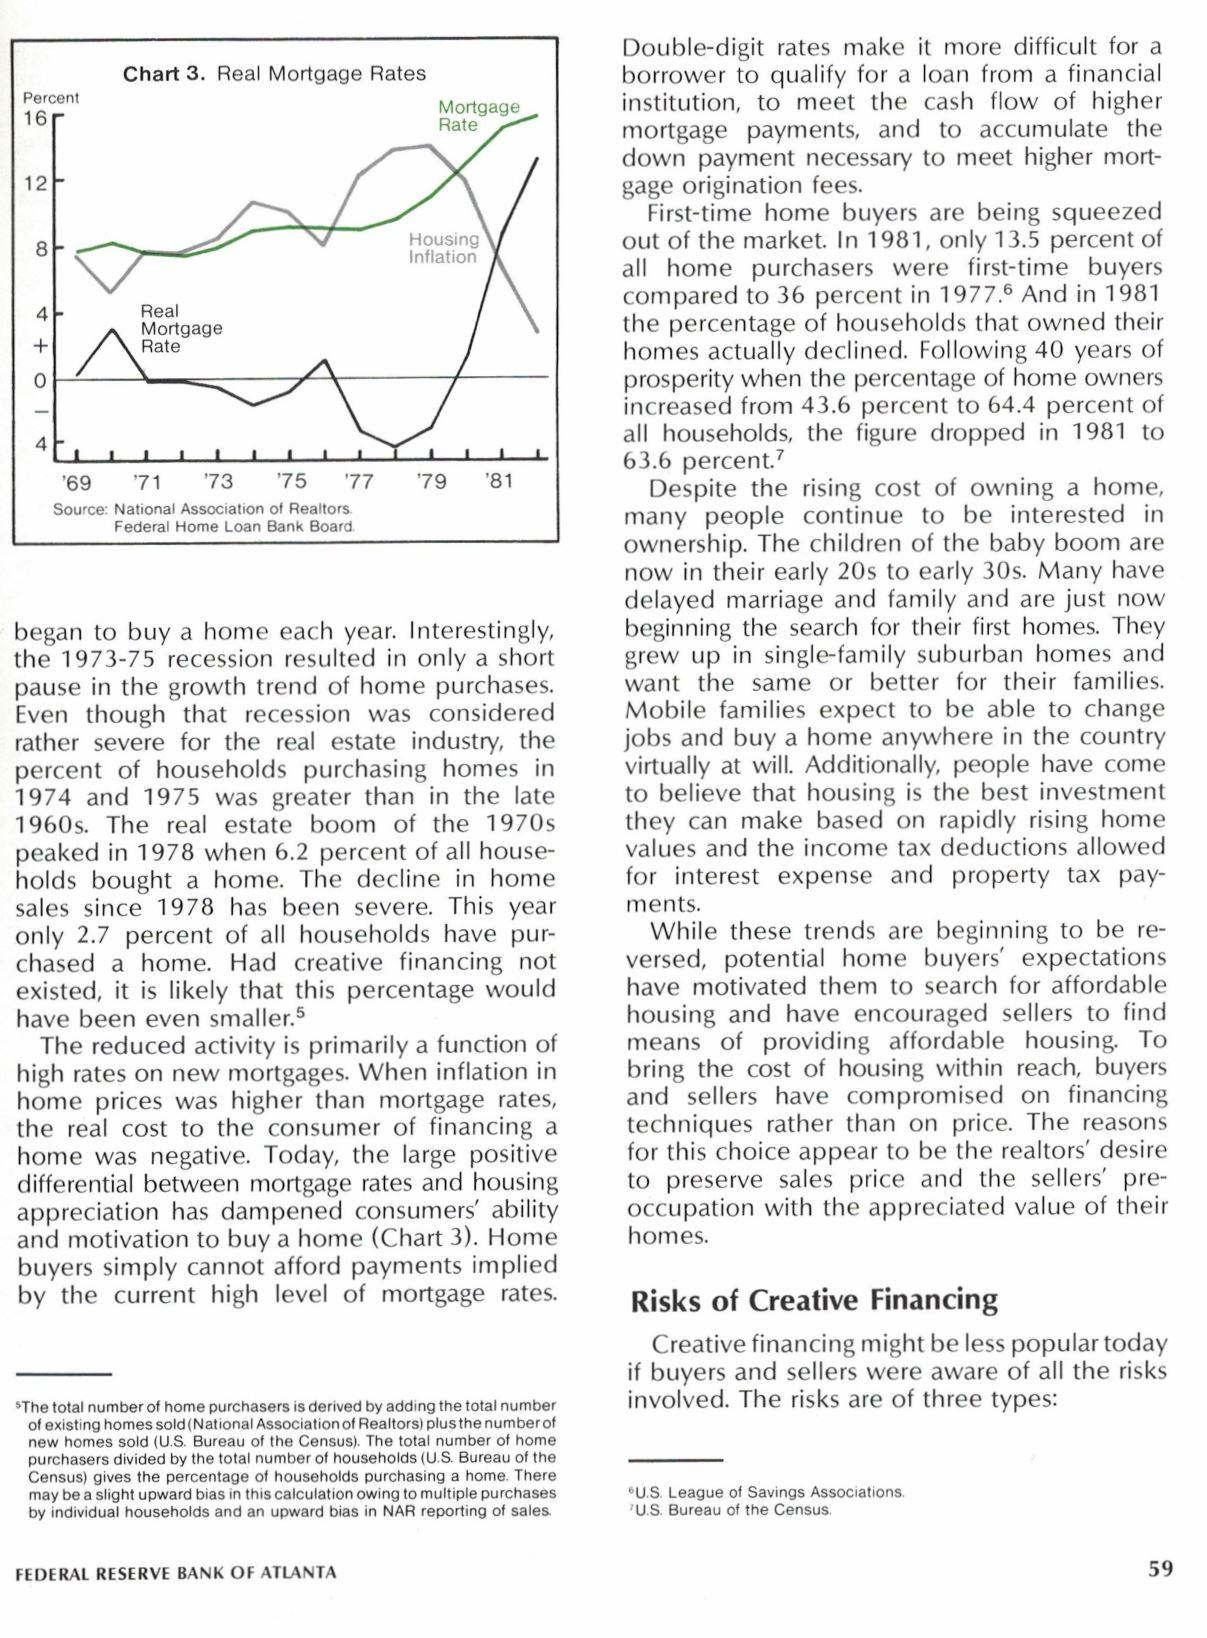 Risks-of-Creative-Financing-3.jpg